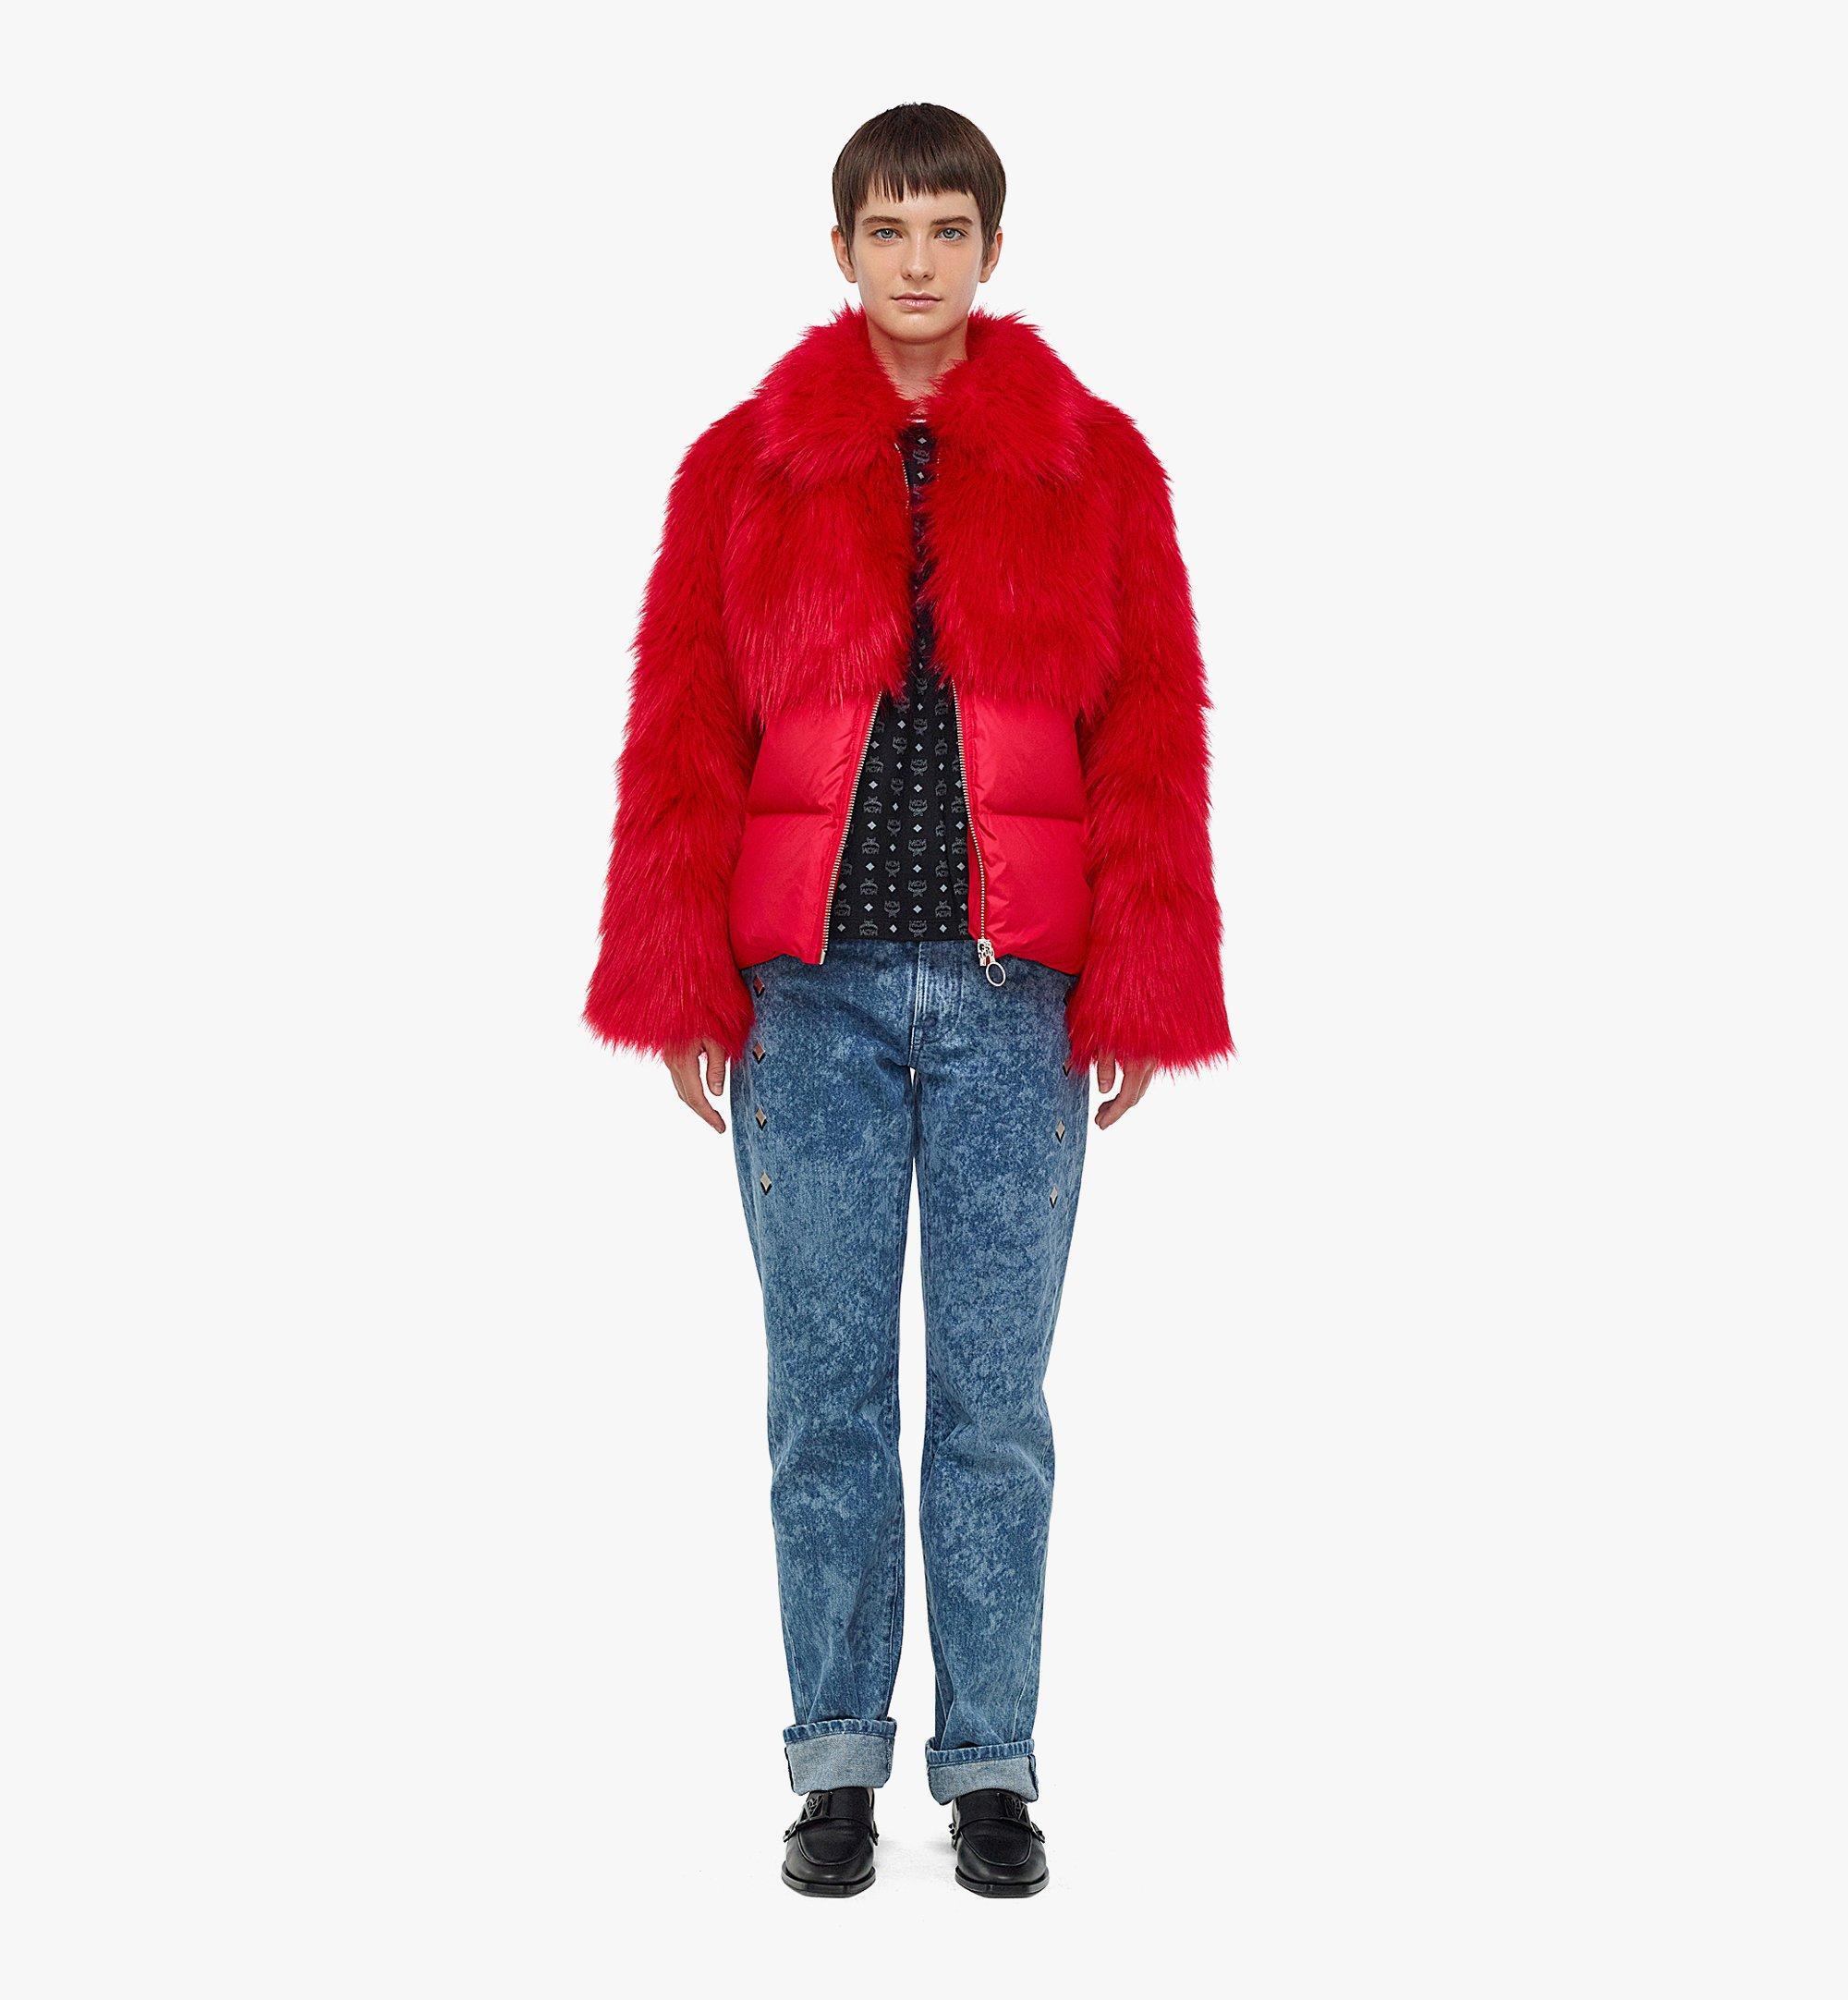 MCM Women's Faux Fur Puffer Jacket Red MFCBAMM02R0038 Alternate View 3